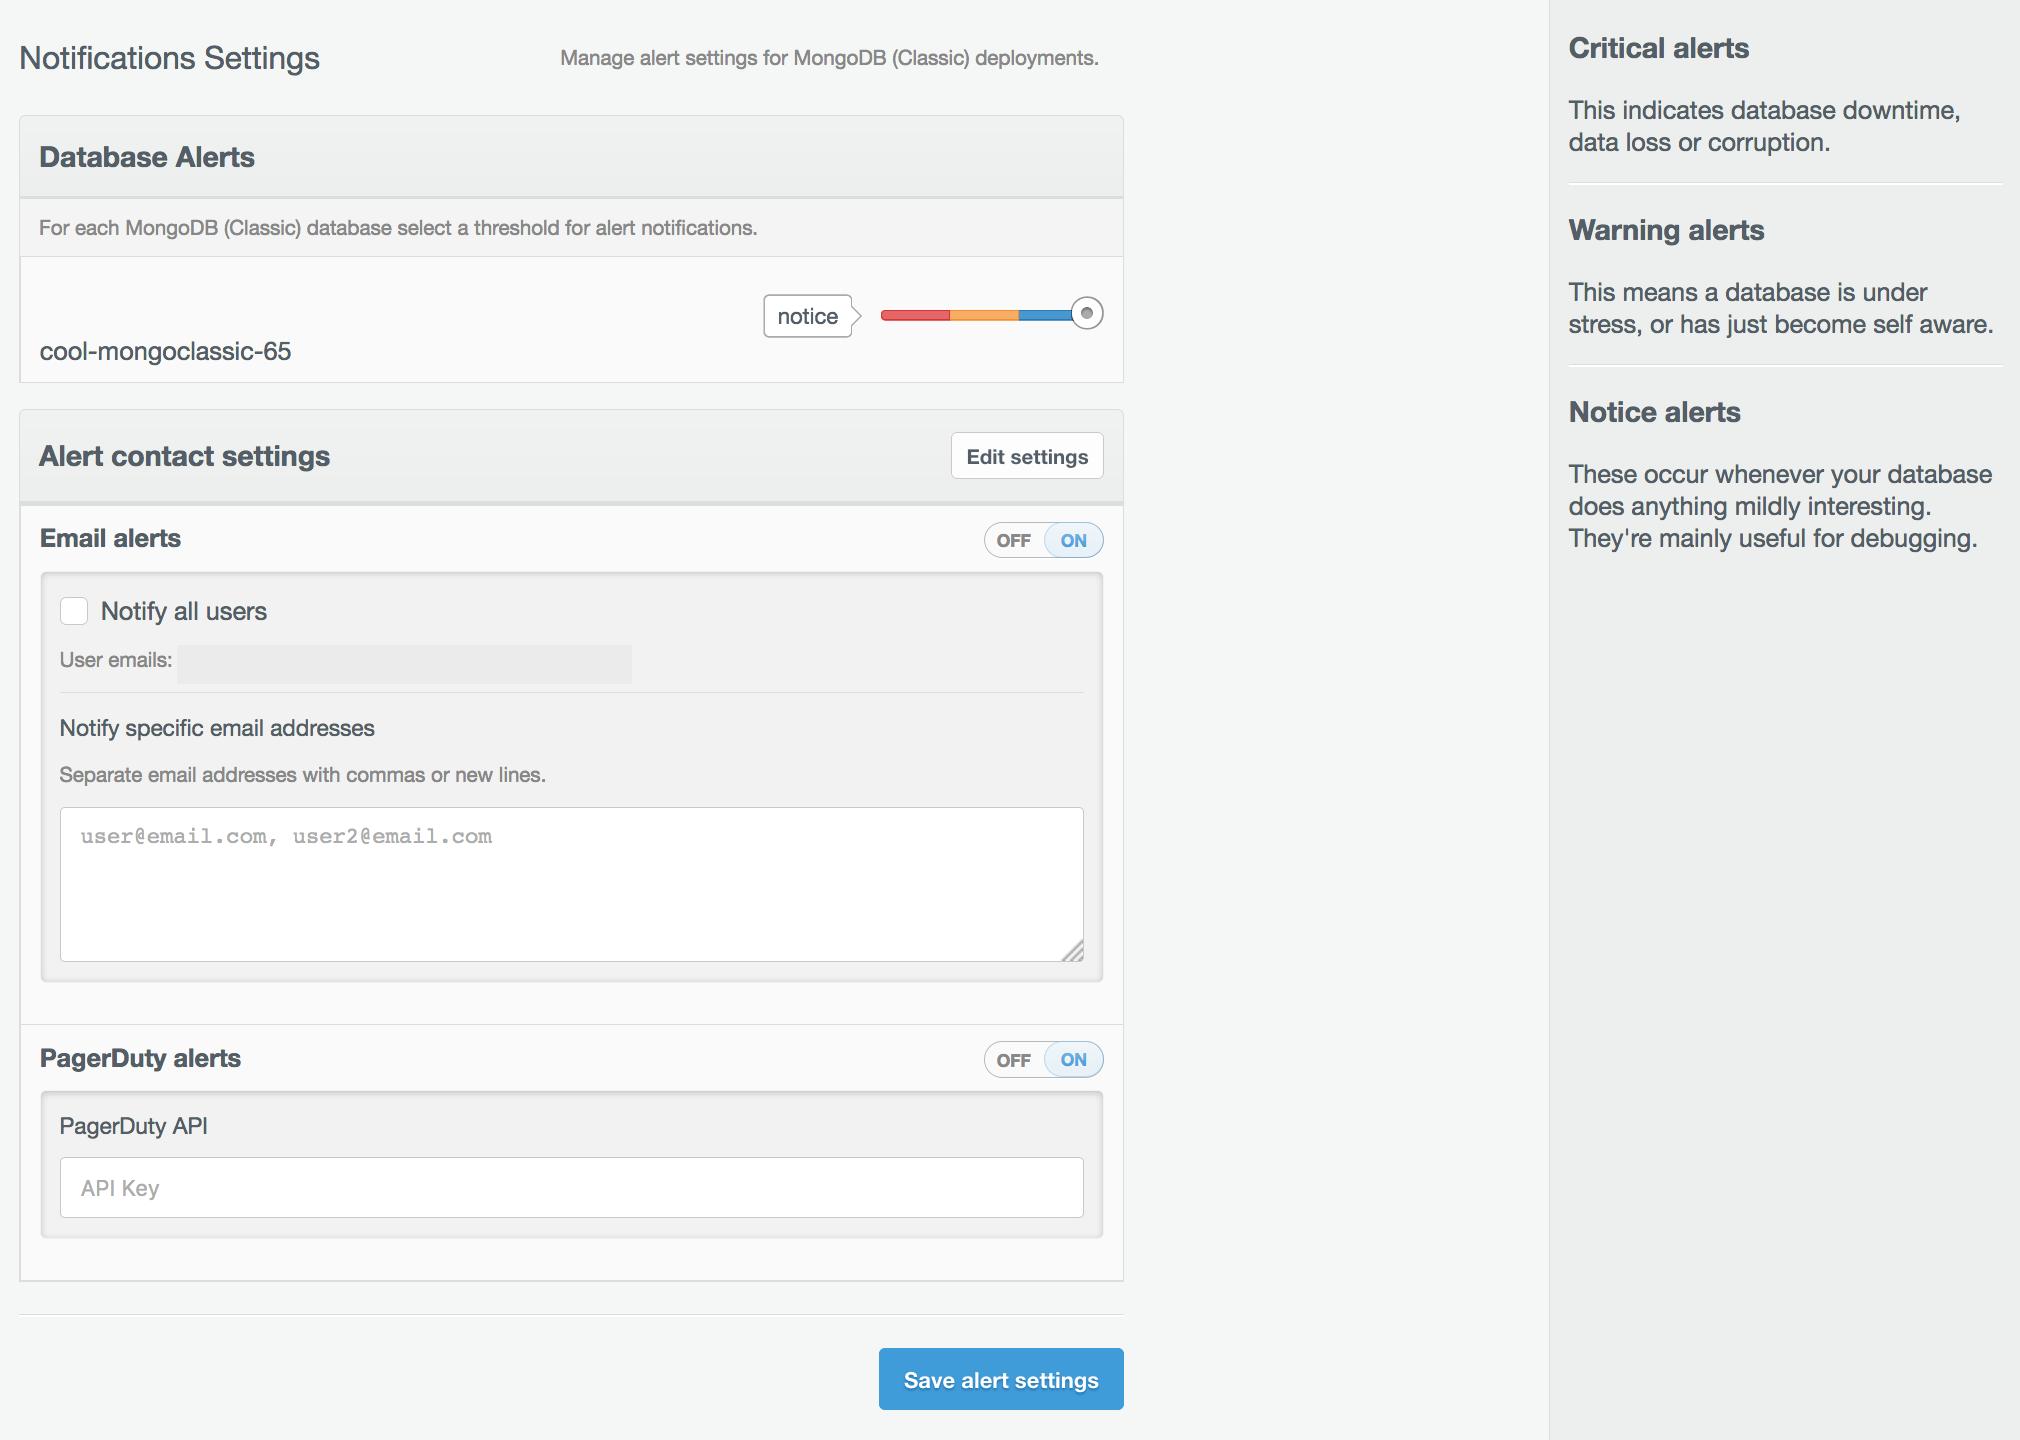 MongoDB Classic alerts and notifications settings.